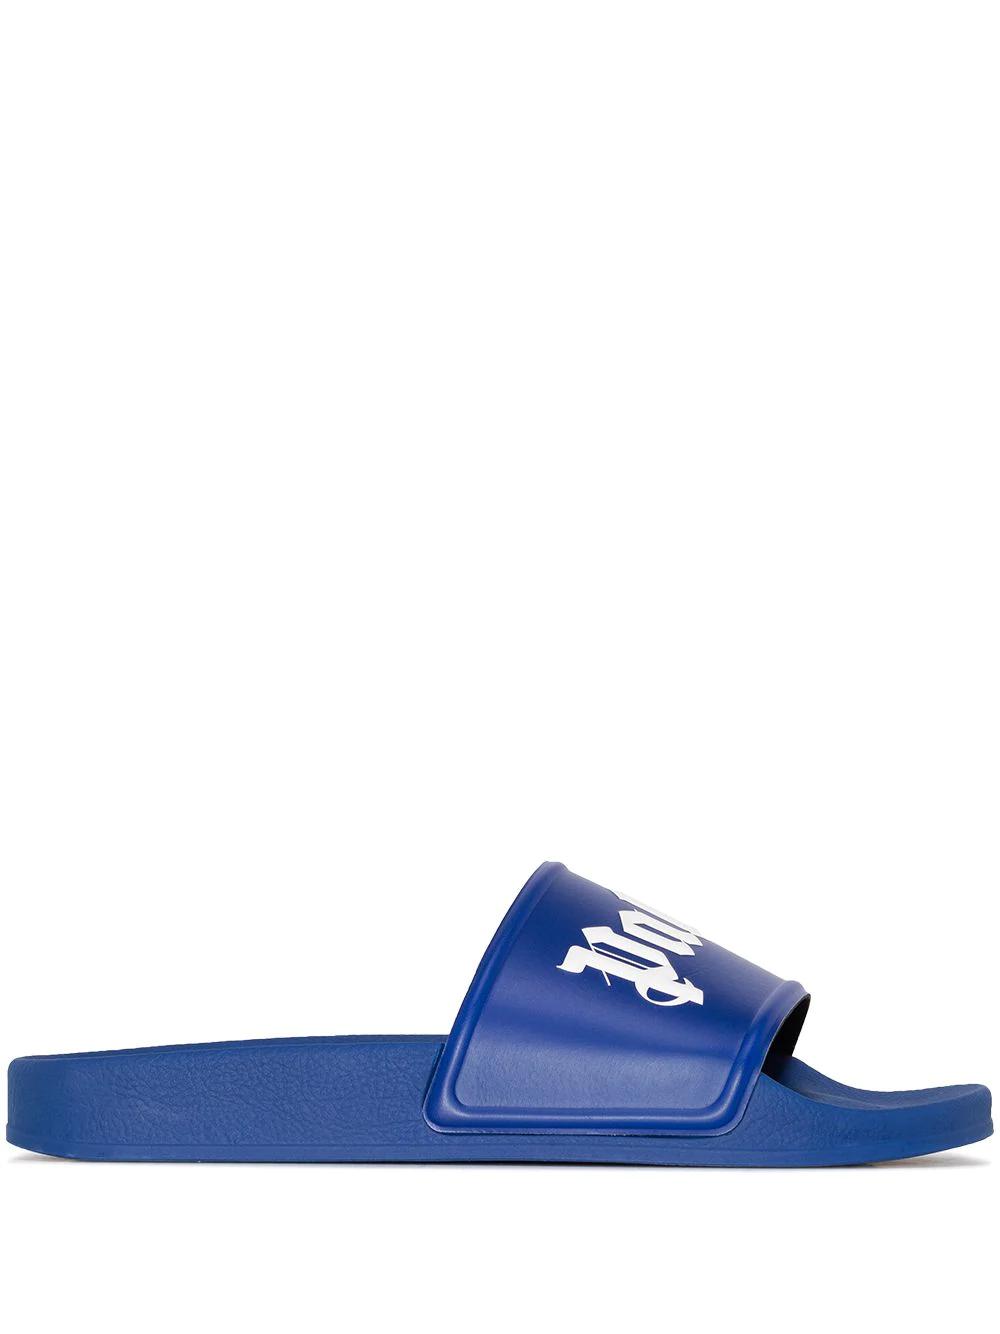 PALM ANGELS Man Blue Slipper With White Logo